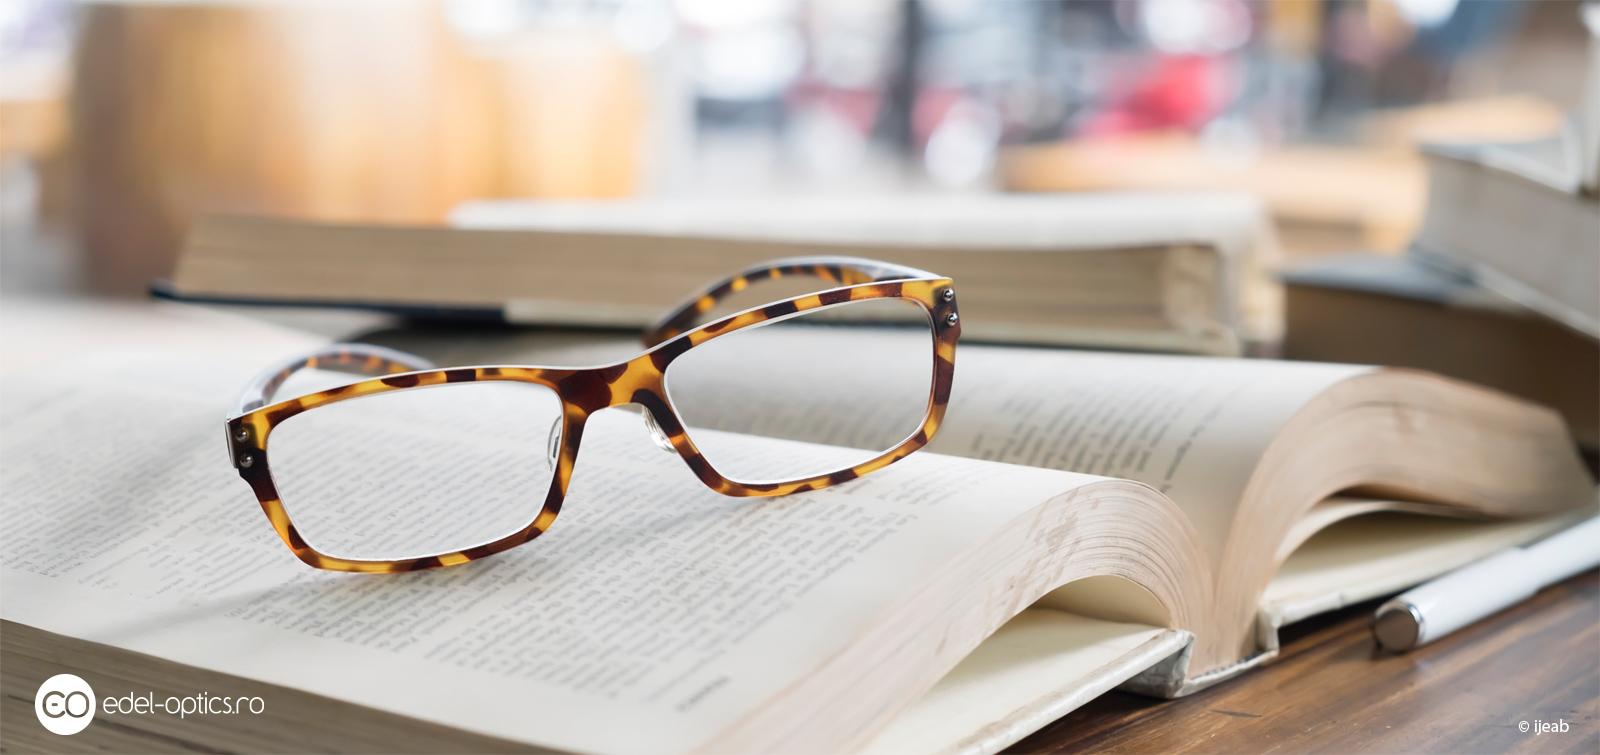 2.1 ochelari de miopie X mărire de televiziune TV lupa-300 gradul de ochelari de protecţie